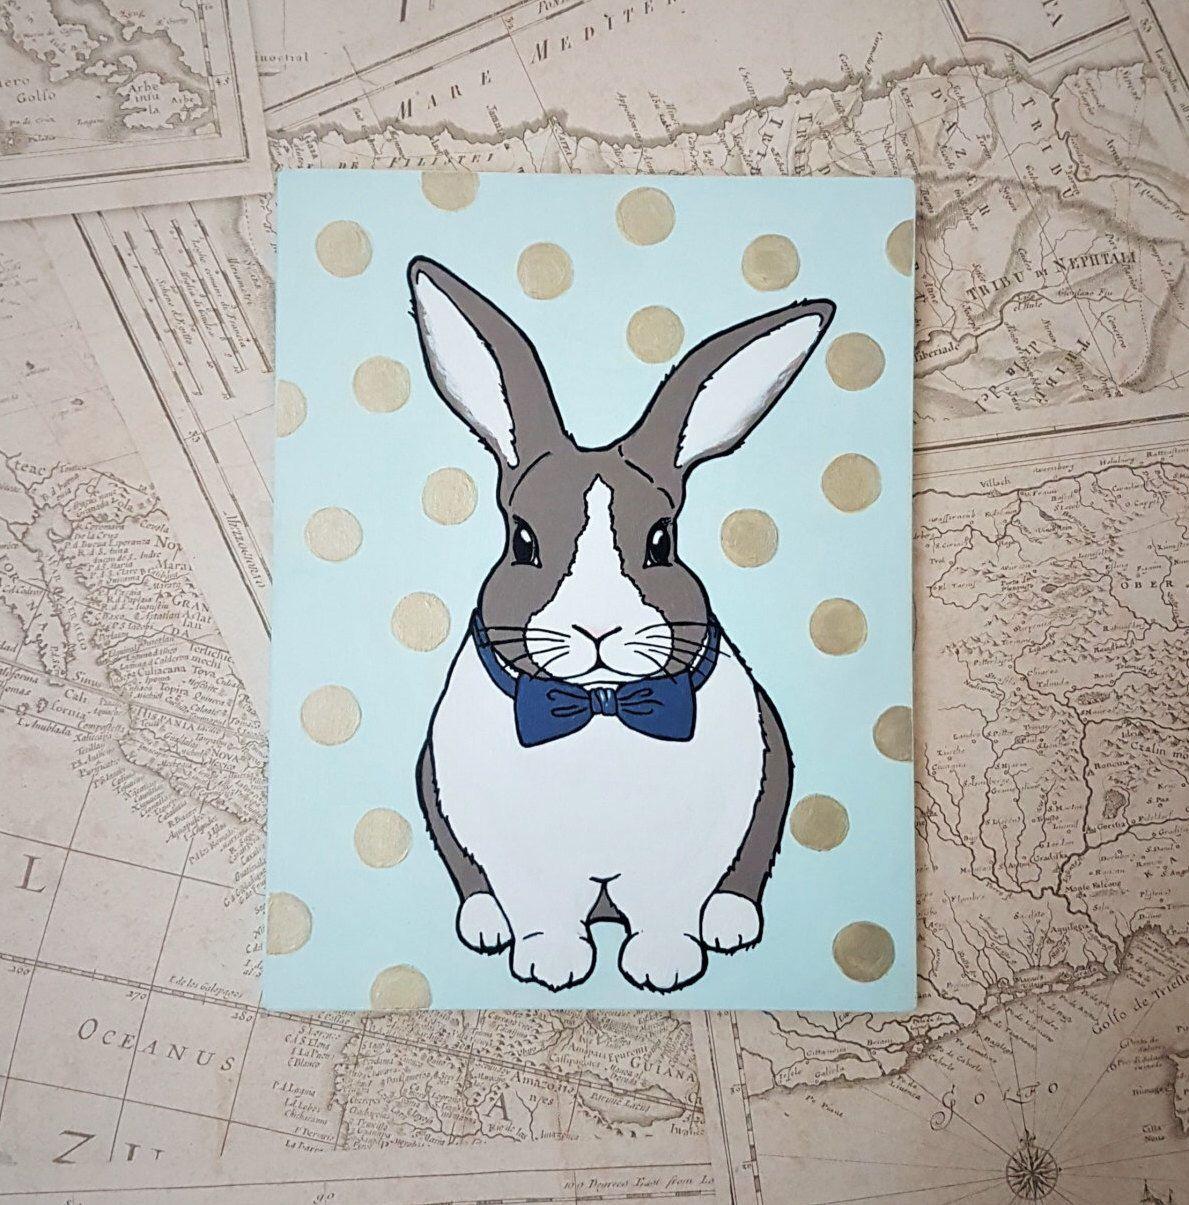 Bunny Nursery Painting Original Rabbit Art Decor Childrens Ilration Room